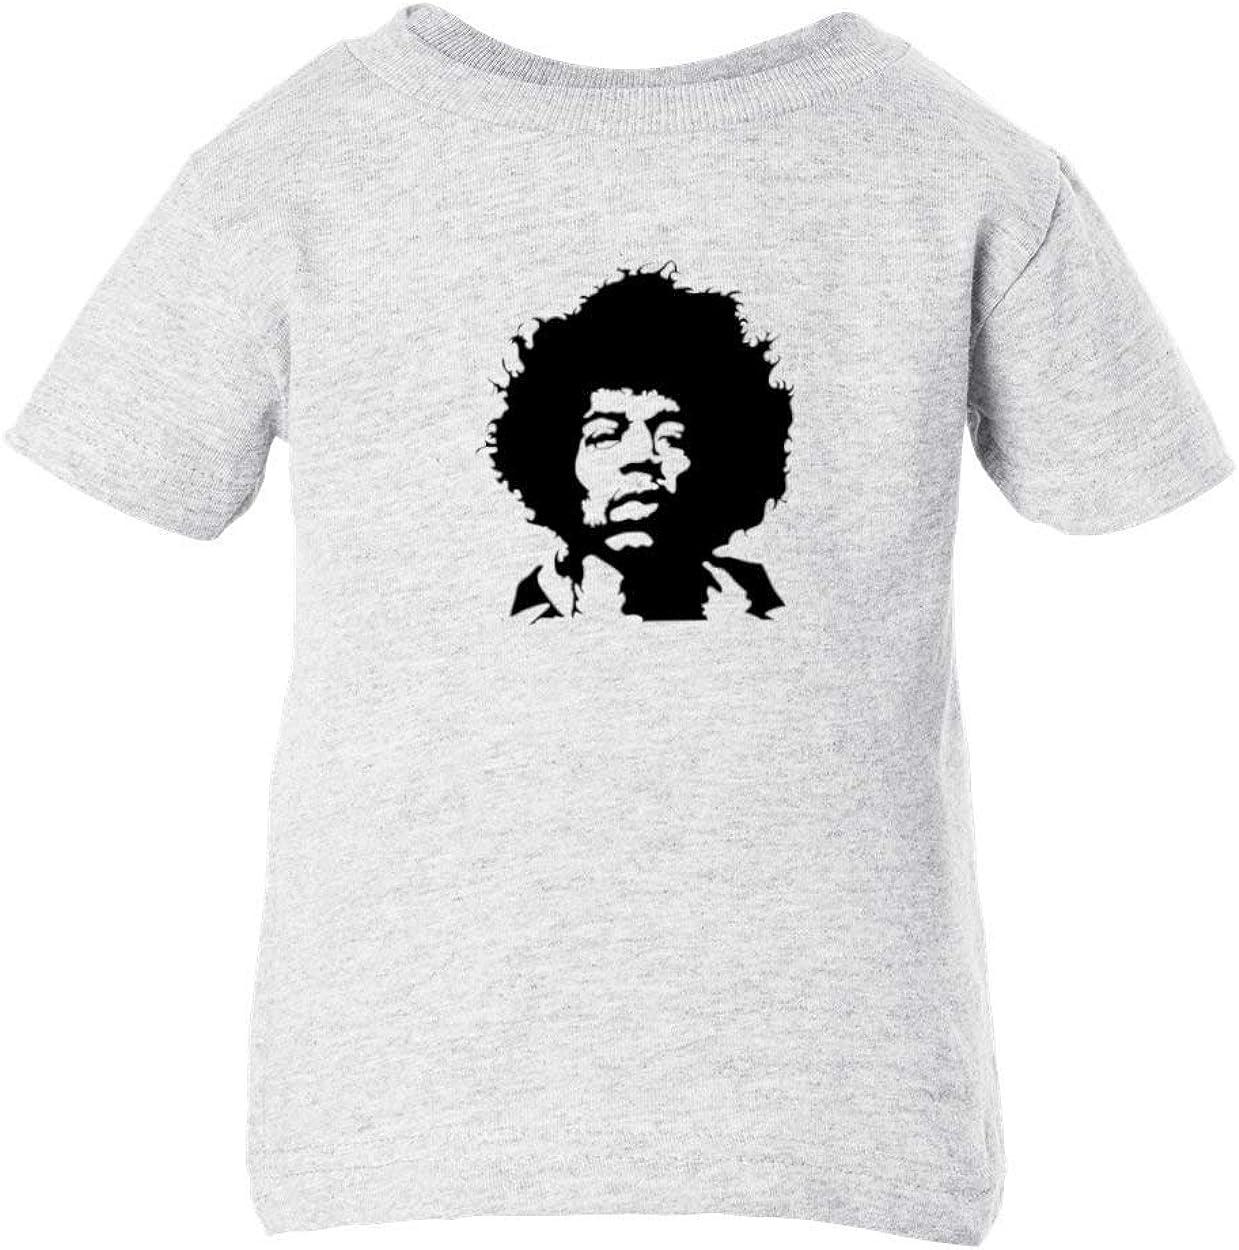 Mari Kyrios Jimi Purple Haze Hendrix Guitar God Rock /& Roll Music Baby Toddler Child Ash T-Shirt